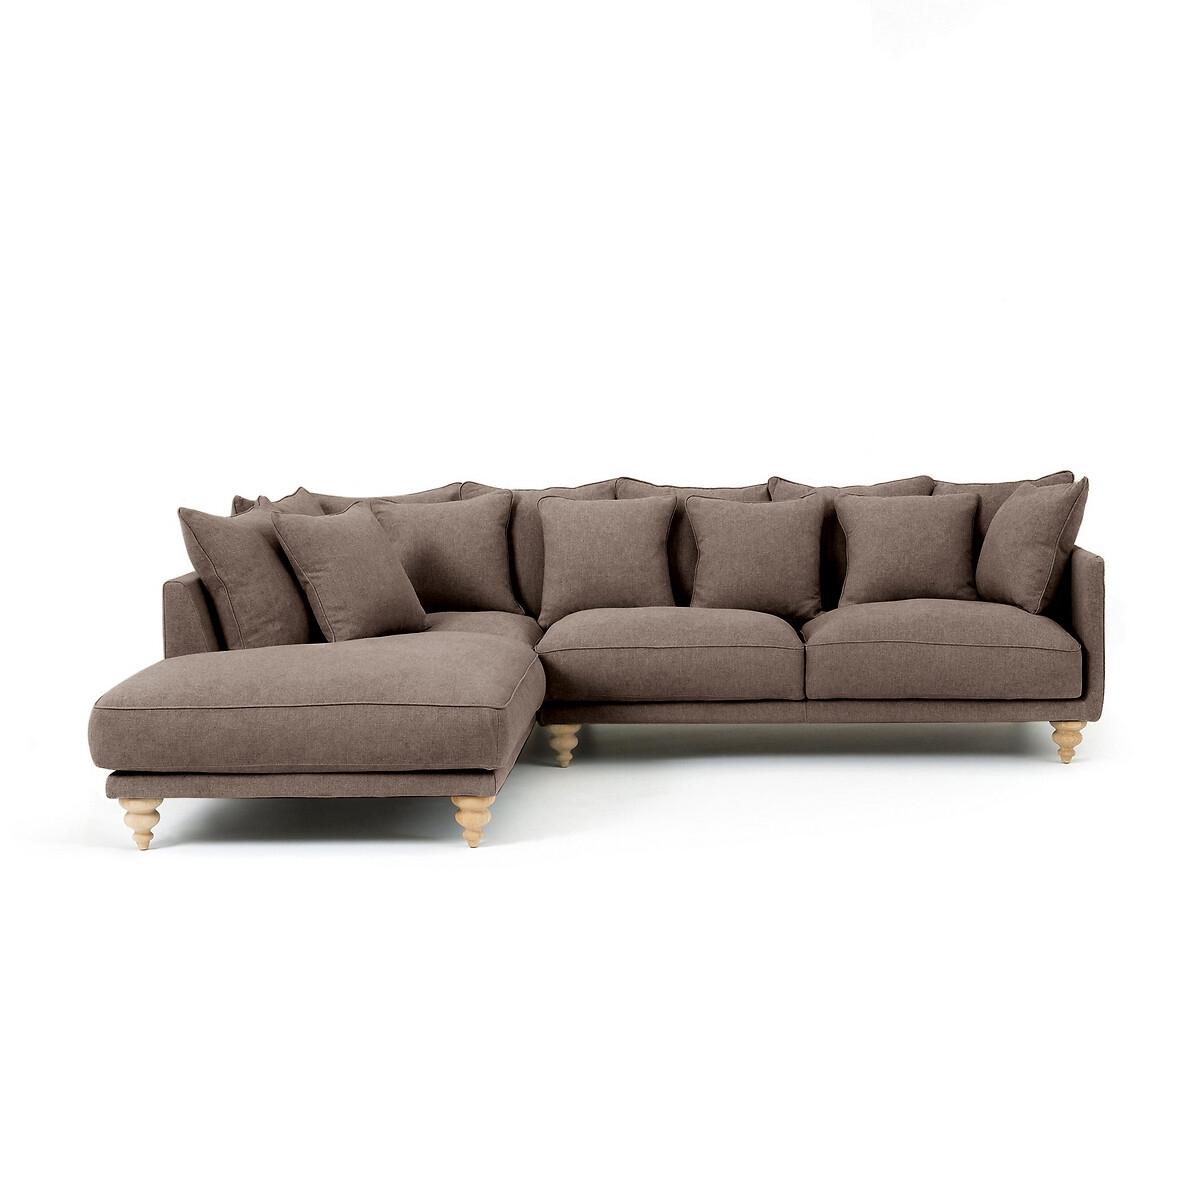 Canapé d'angle Beige Tissu Luxe Contemporain Confort